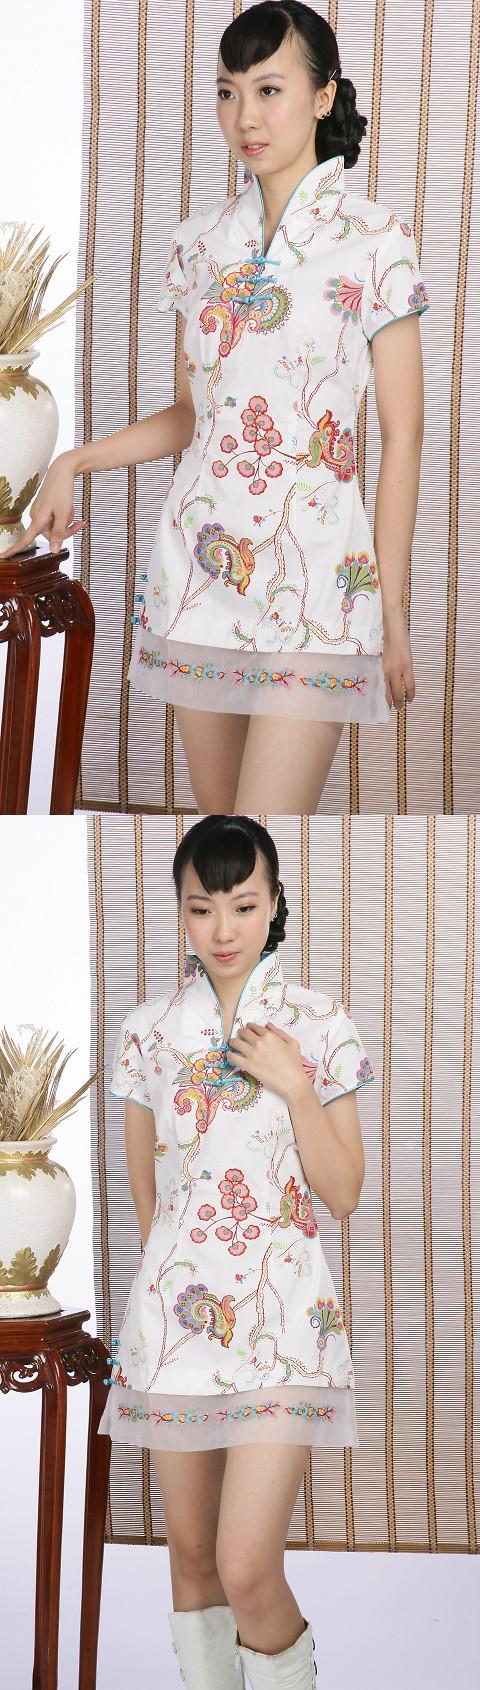 Short-sleeve Printed Pattern Cheongsam Dress (White)